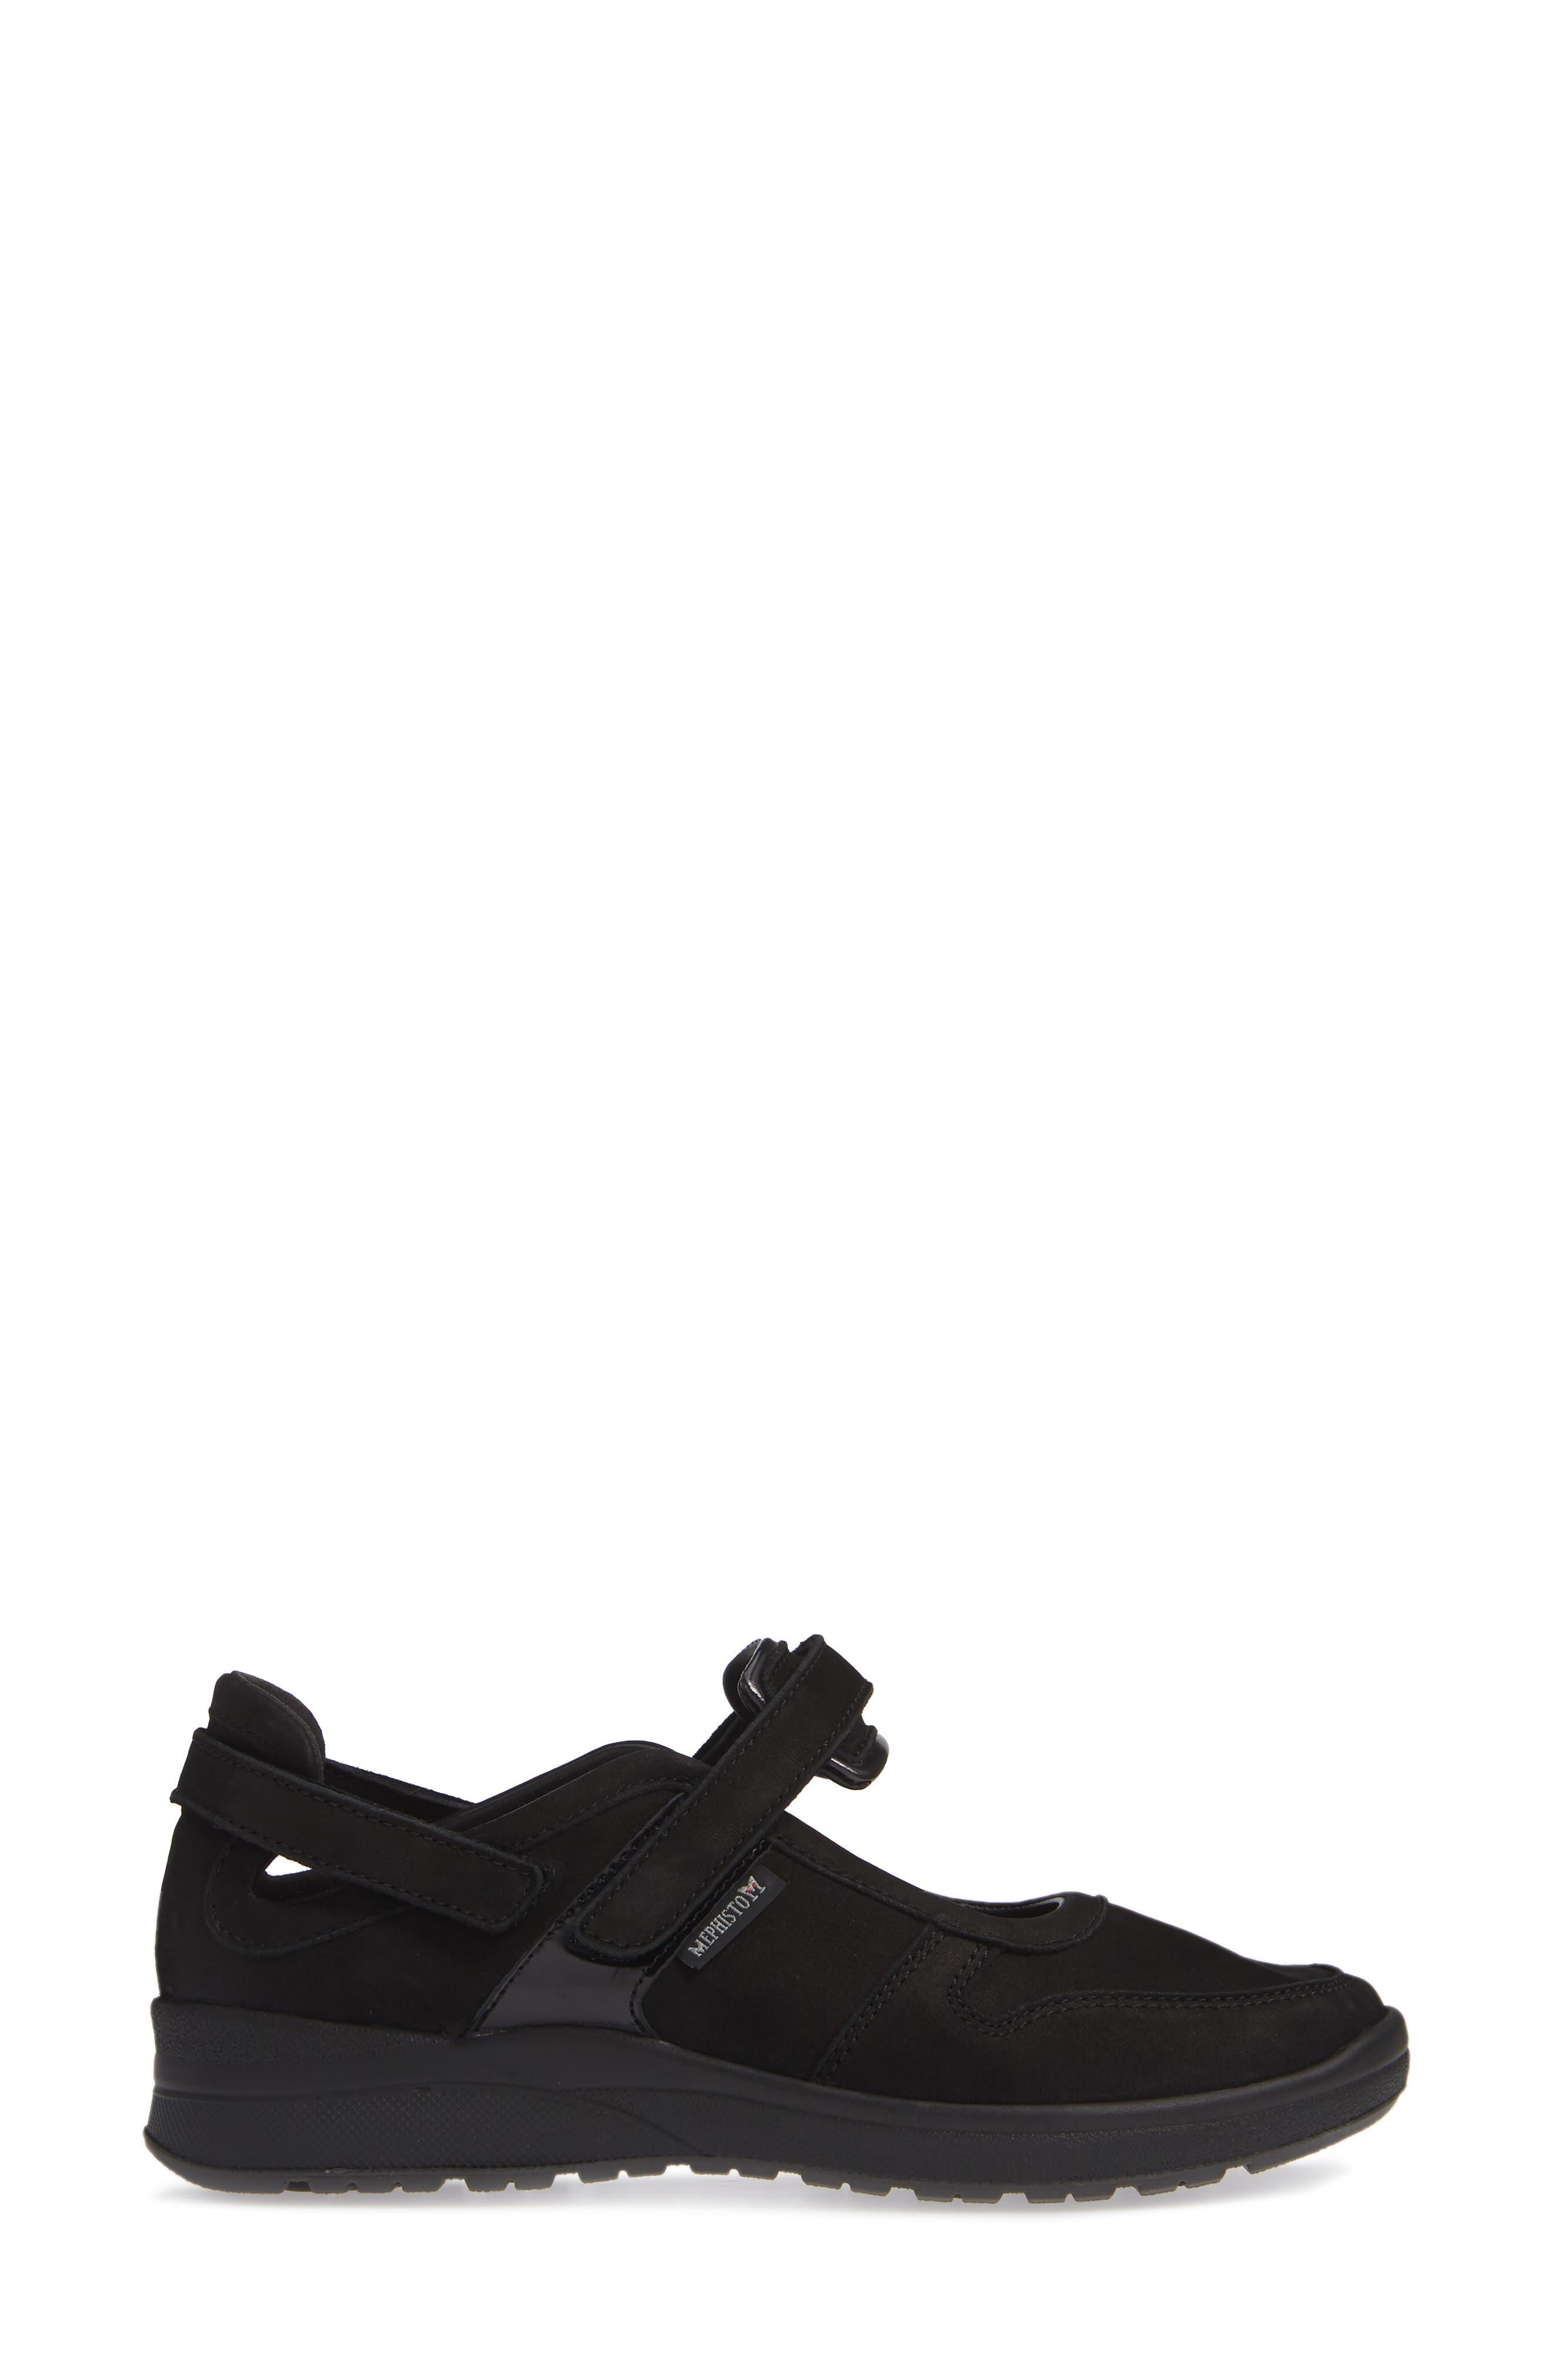 MEPHISTO, Rejine Sneaker, Alternate thumbnail 3, color, BLACK FABRIC